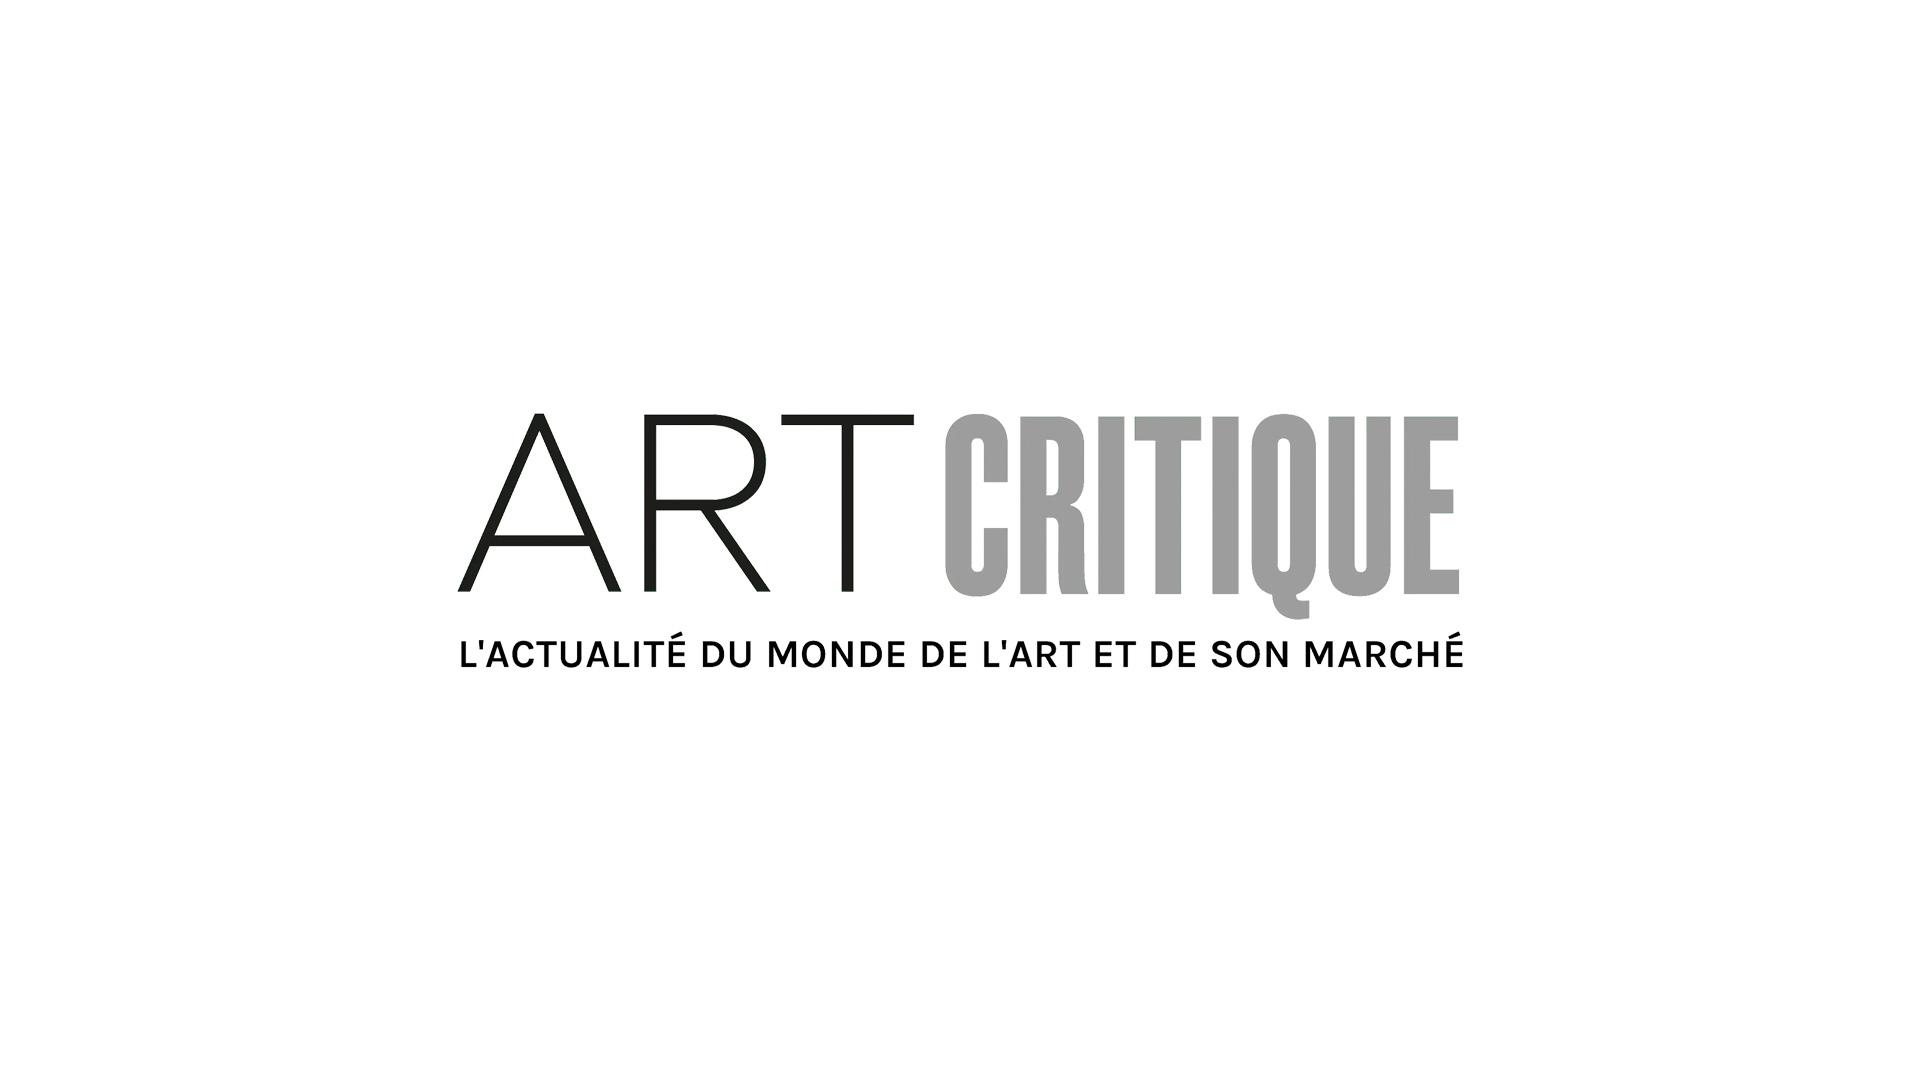 Facebook hires Guggenheim's Tina Vaz to head its artist residency program